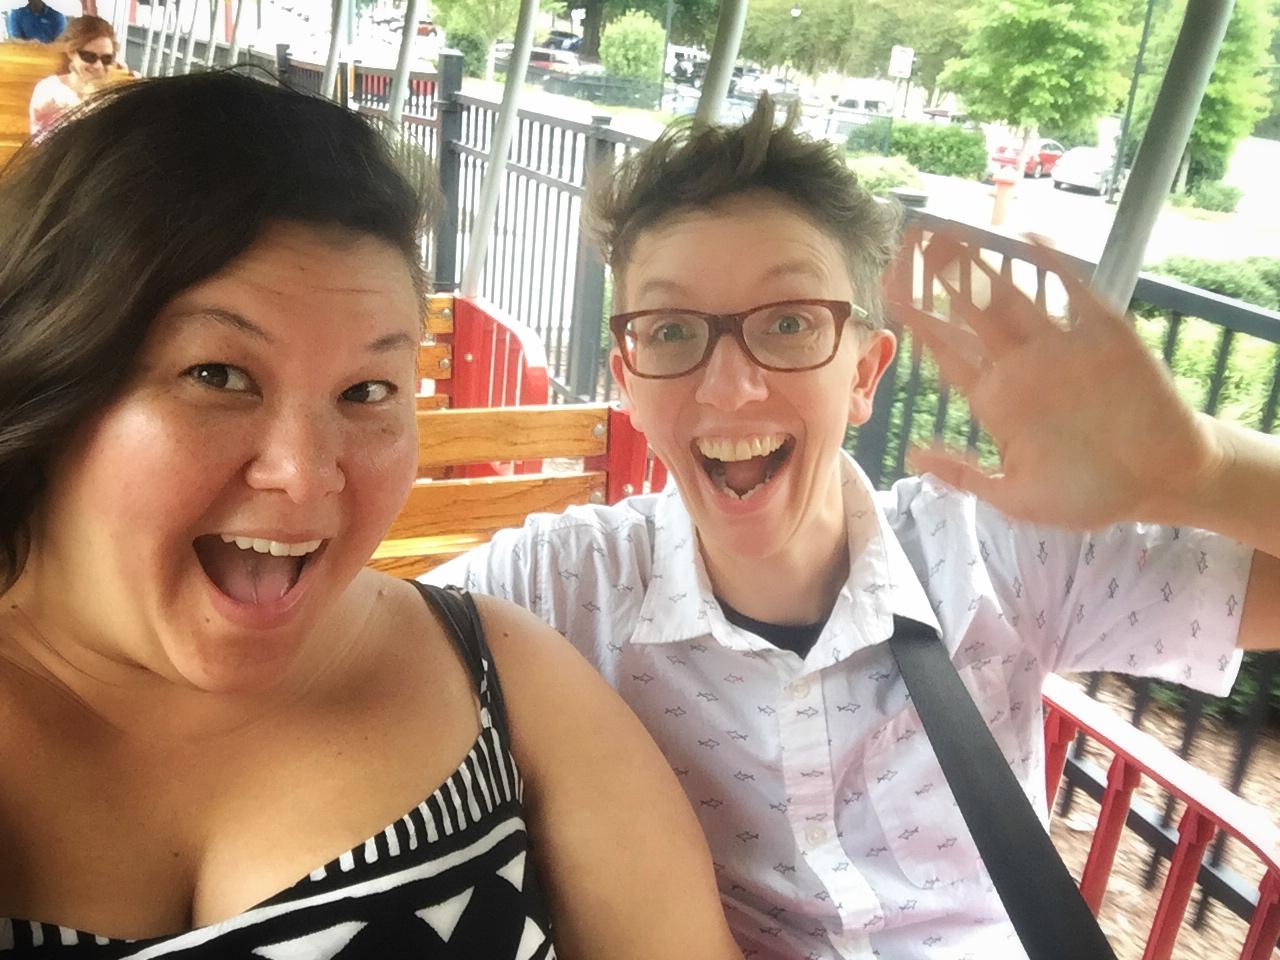 Riding the kiddie train on Rachel's birthday. Pullen Park,September 2017.